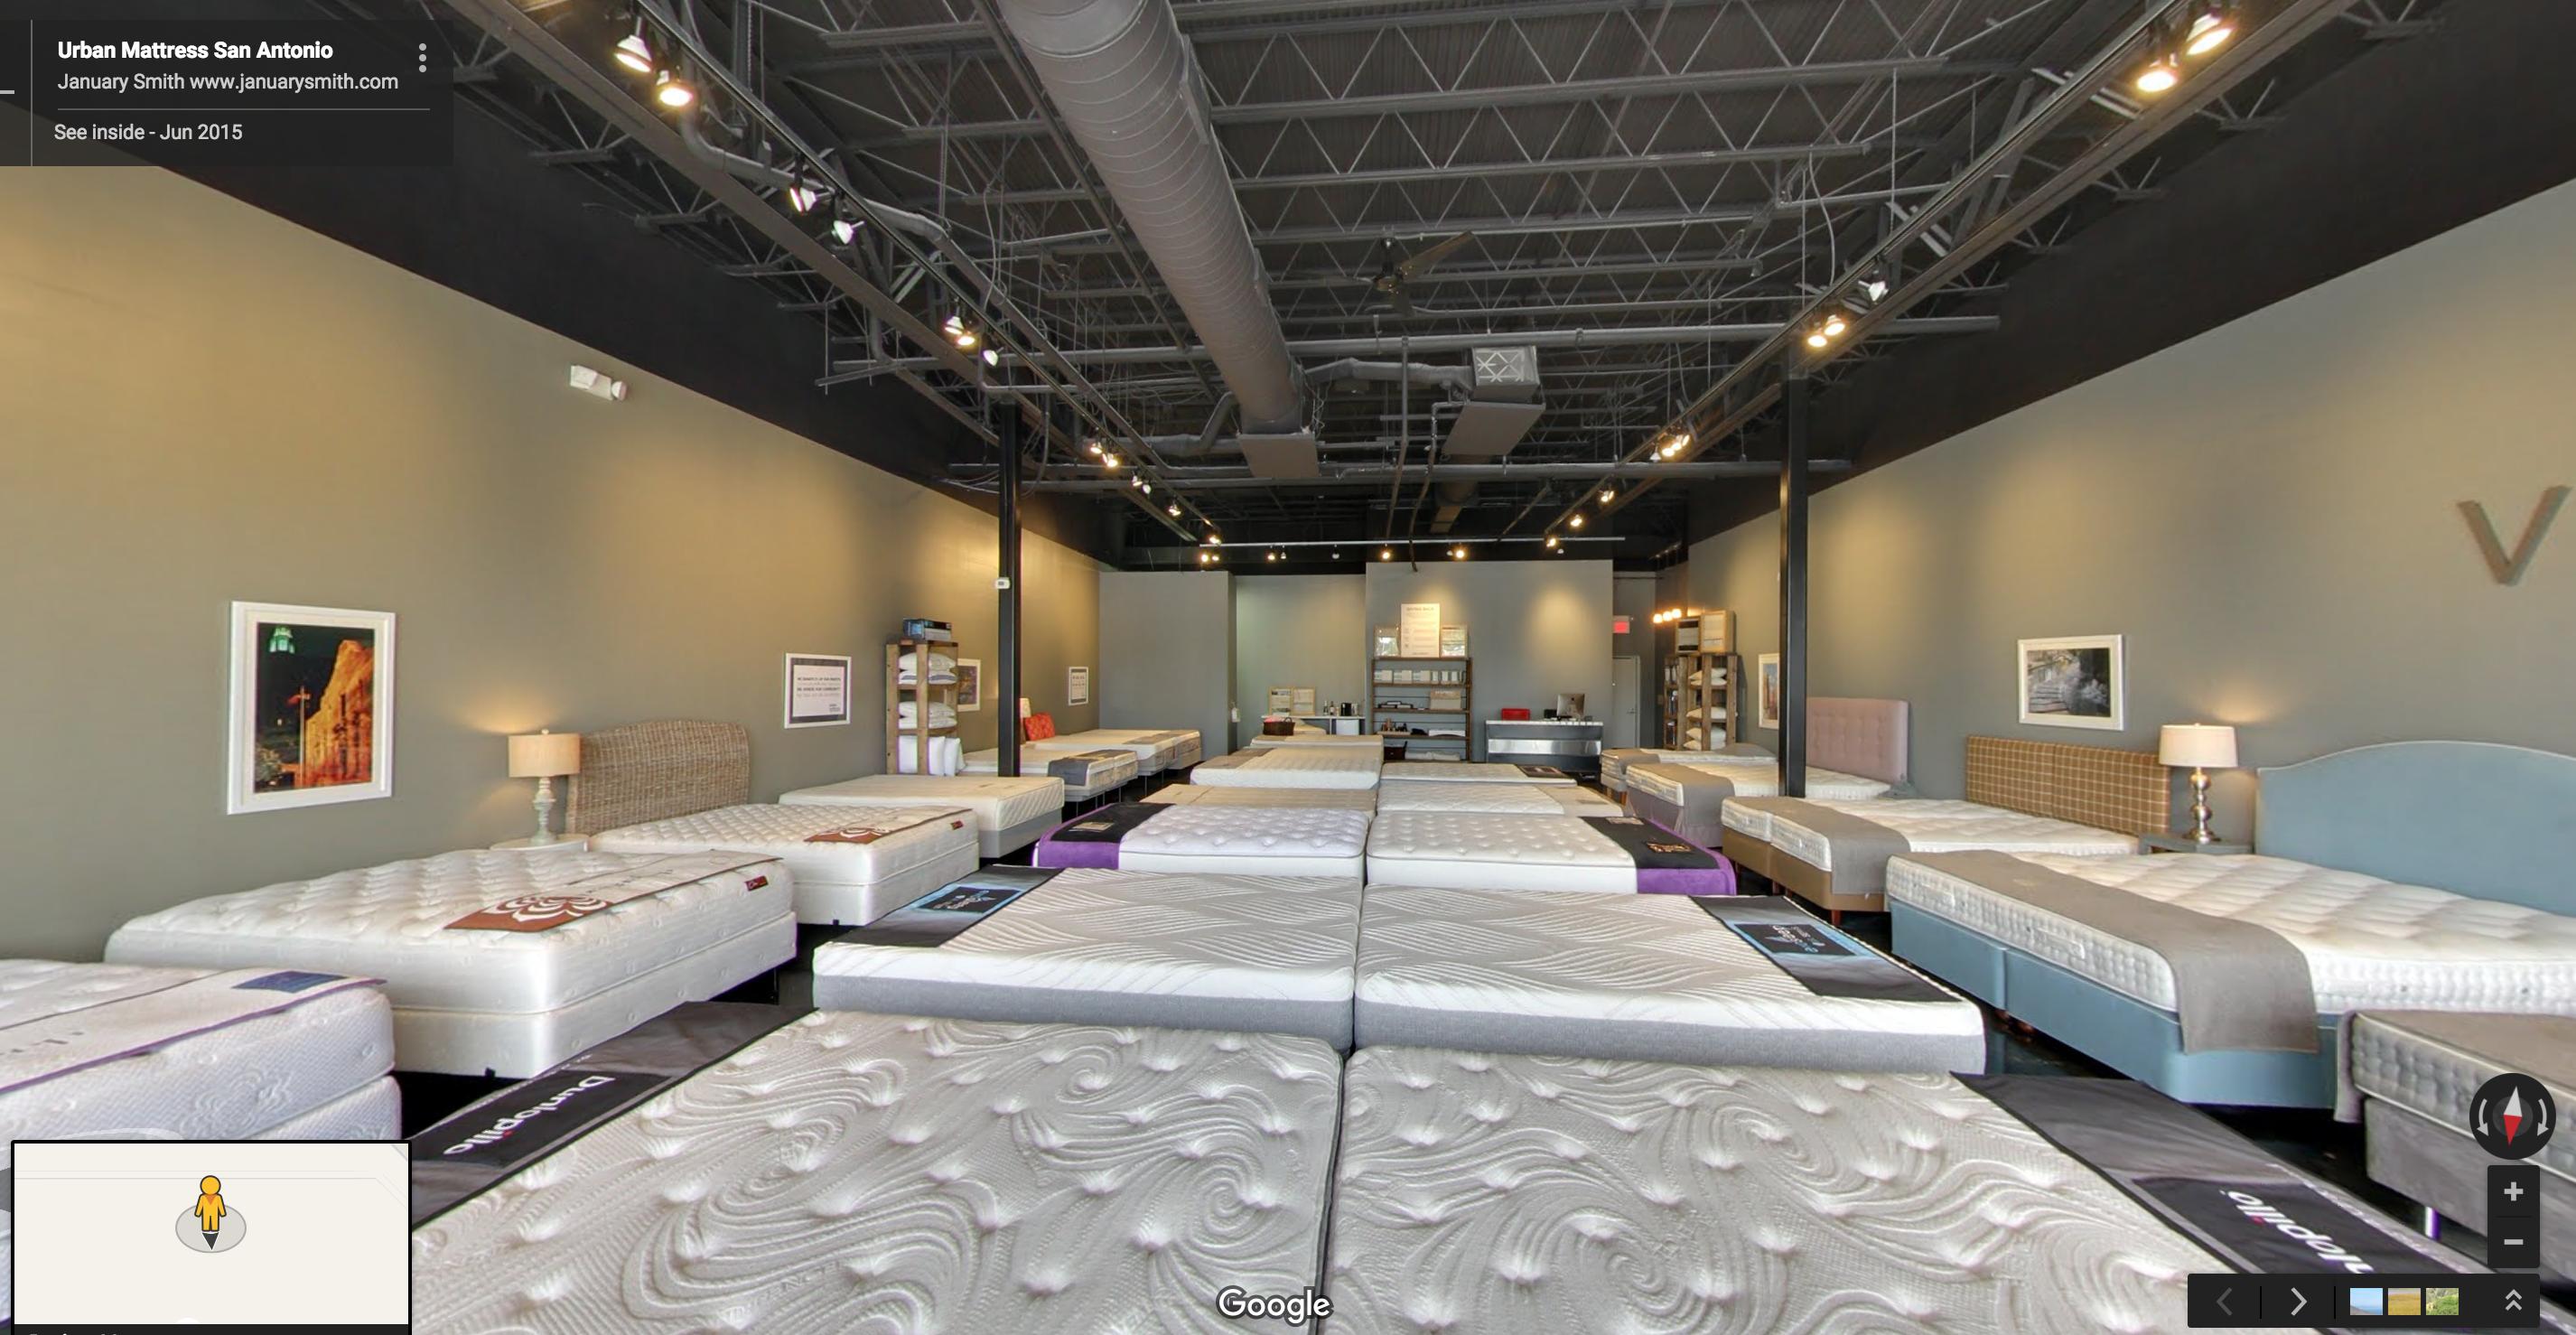 Houston baby & kid stuff - craigslist: houston, TX jobs America mattress gallery san antonio tx